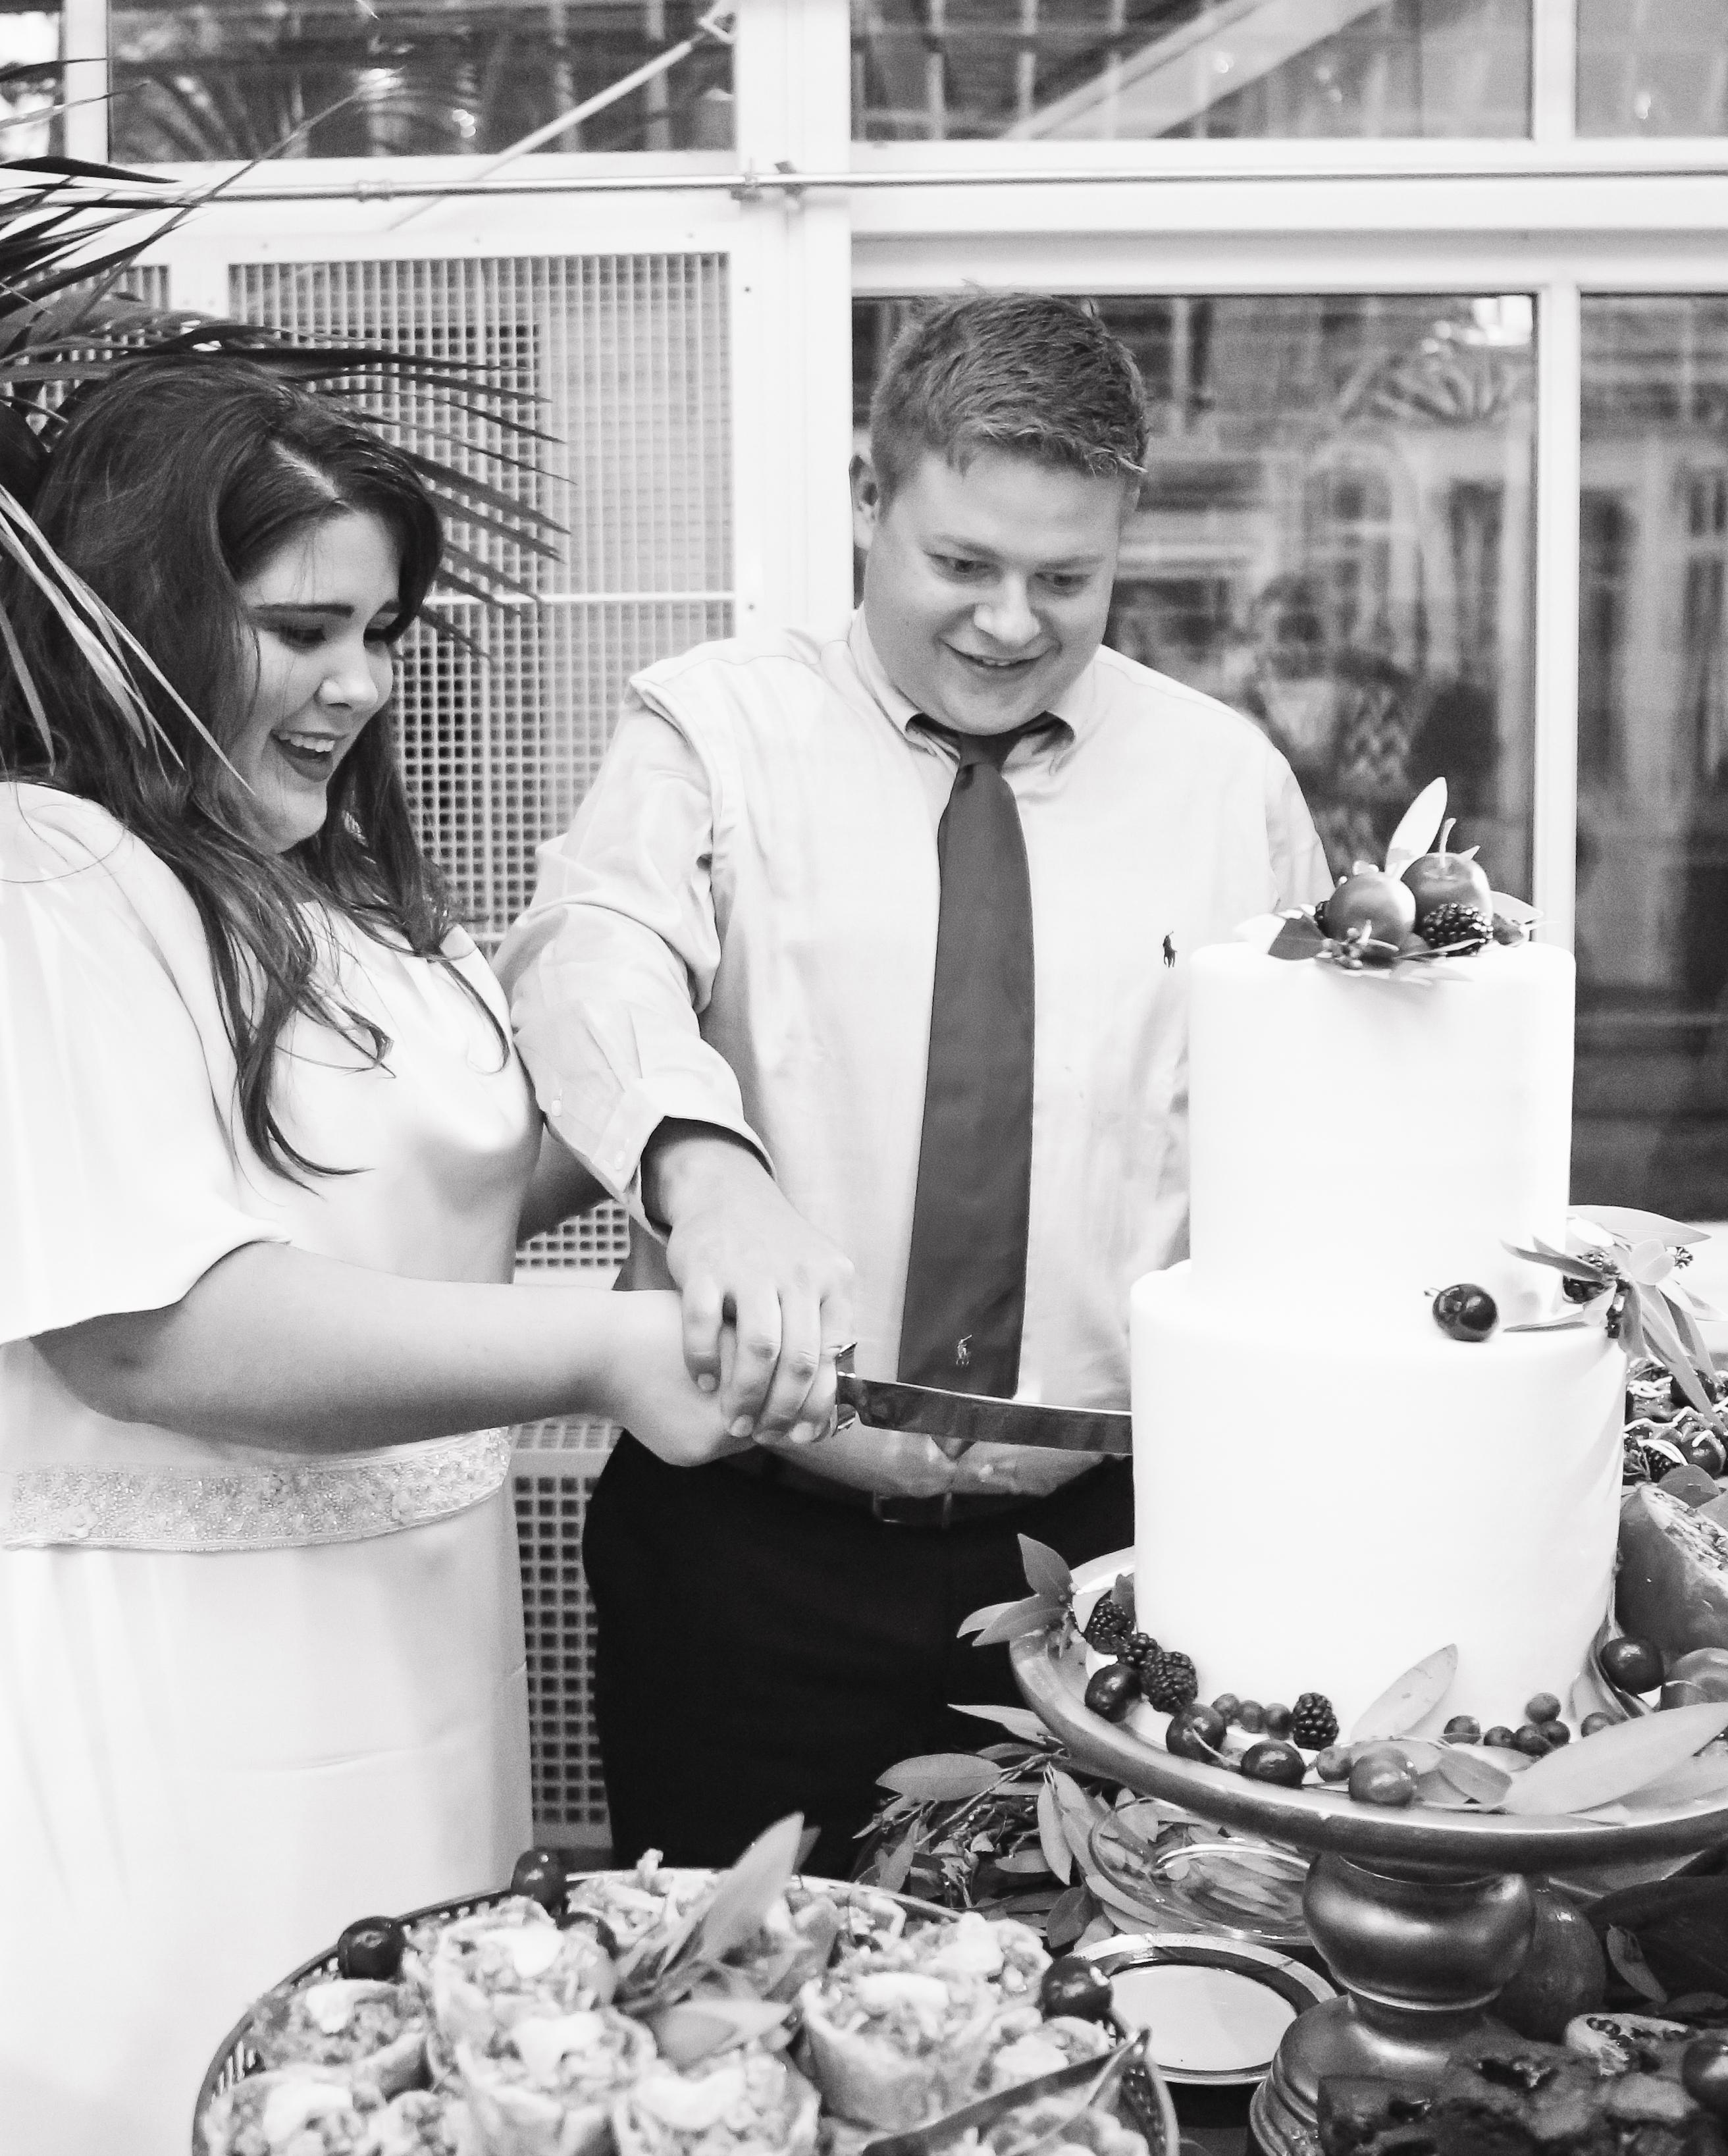 jessie-justin-wedding-cakecutting-74-s112135-0915.jpg